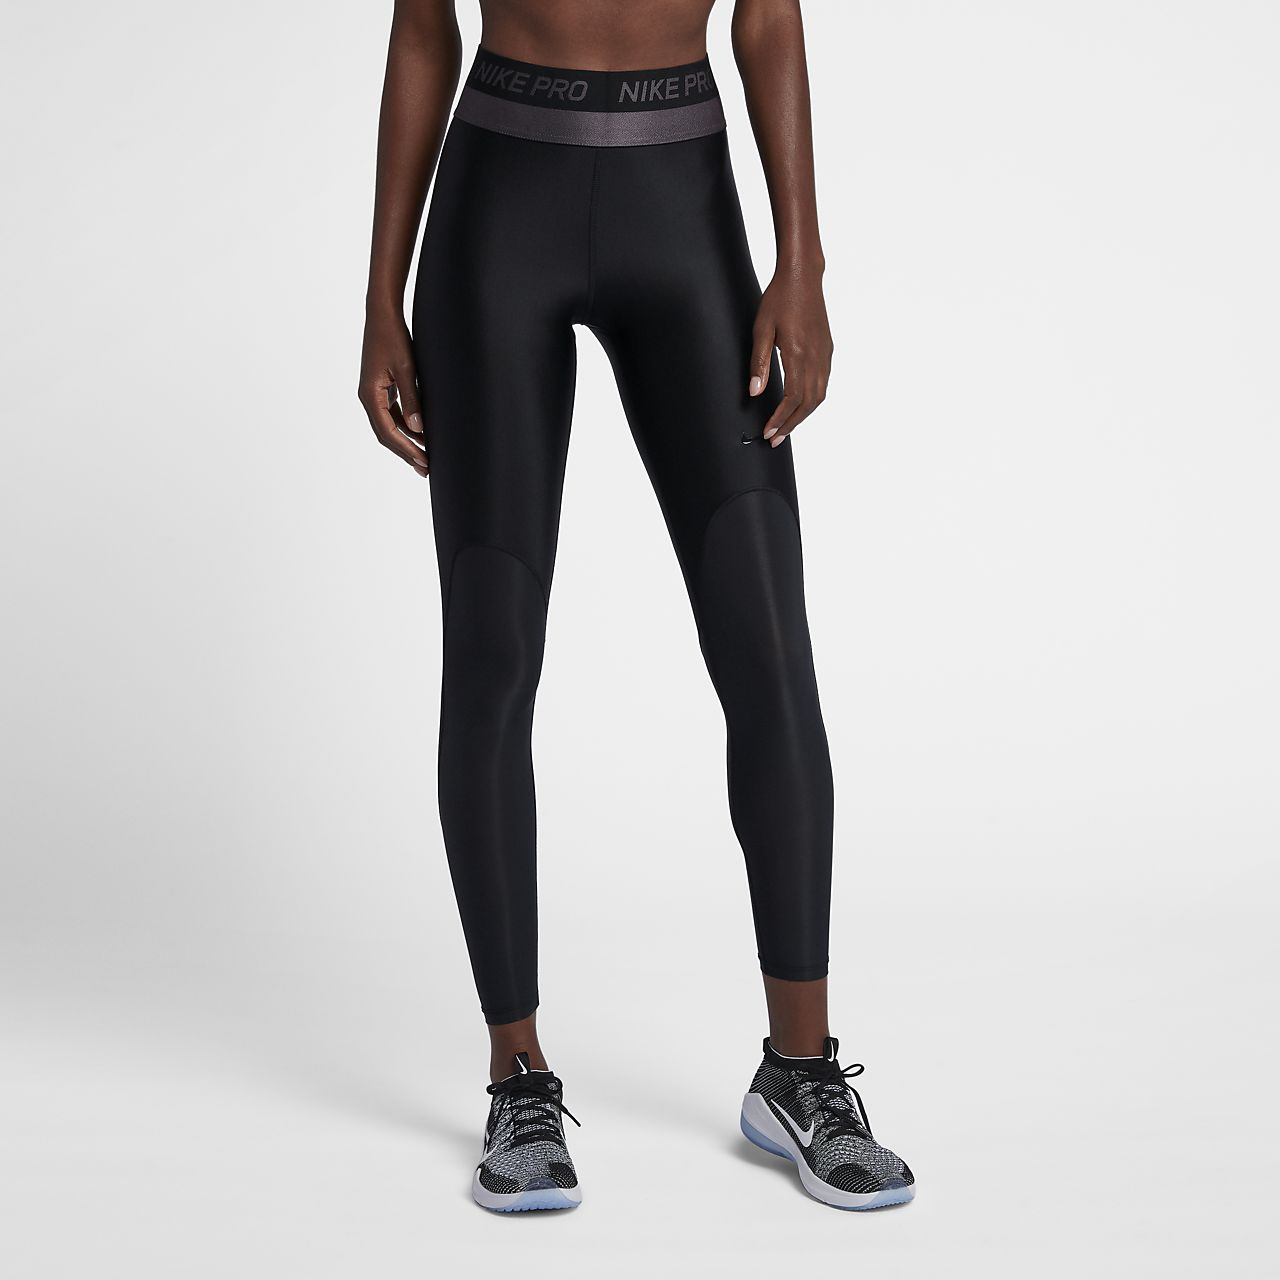 Tight de training taille mi-basse Nike Pro HyperCool pour Femme